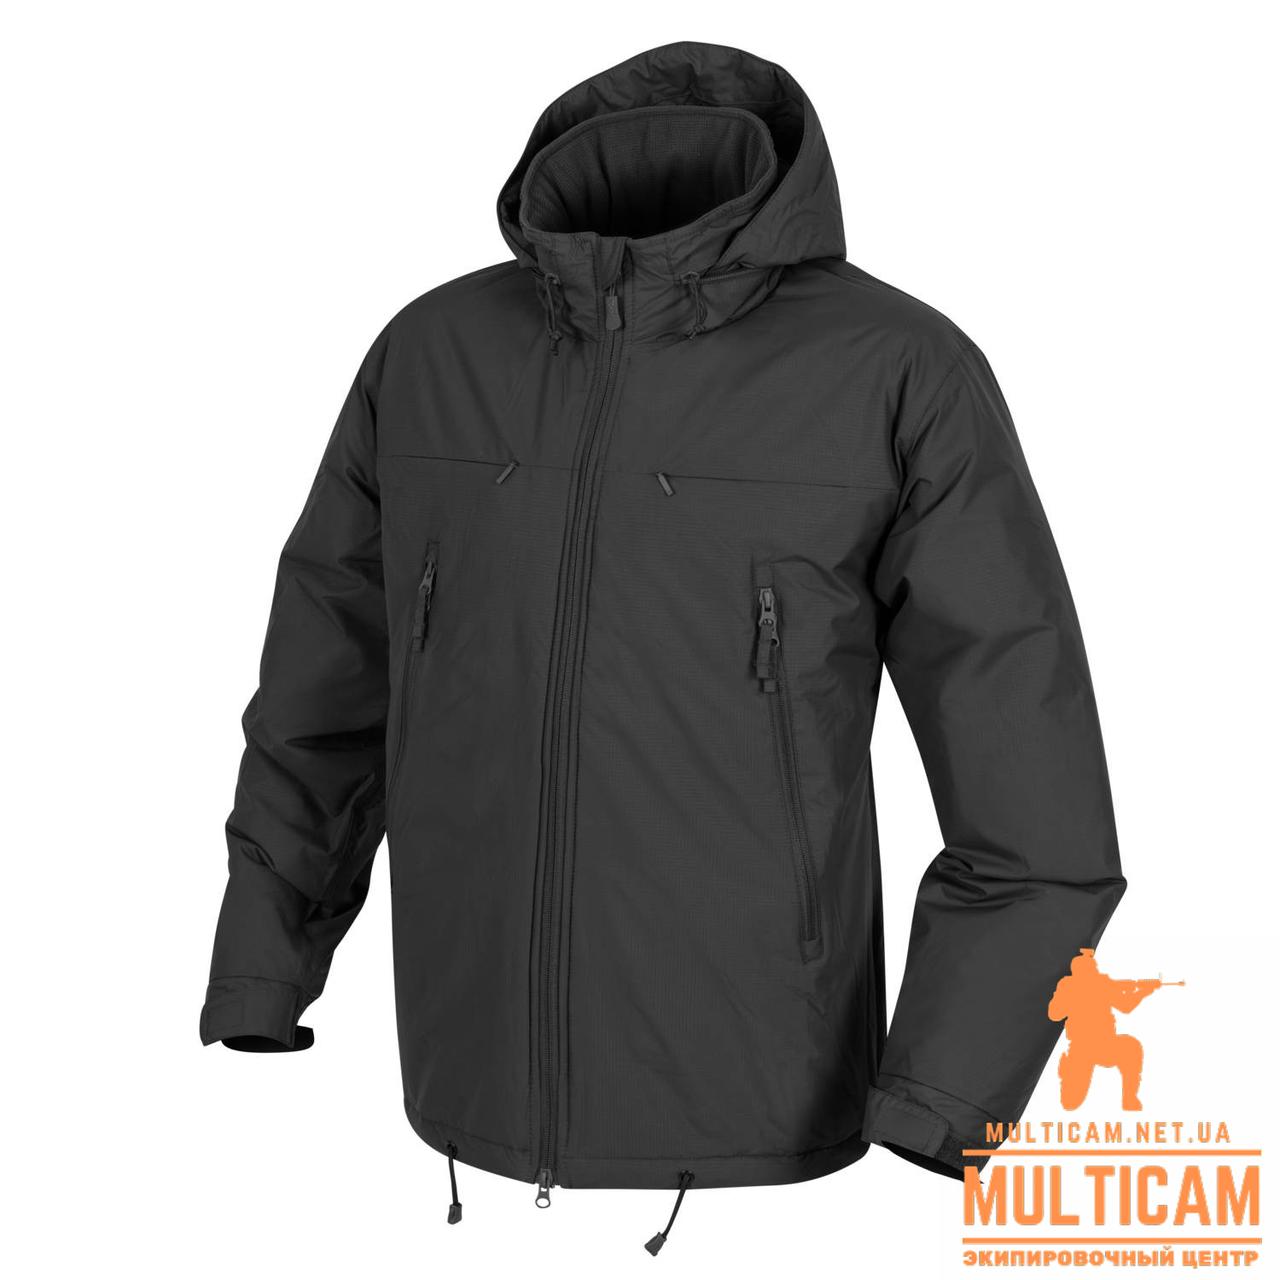 Куртка зимняя Helikon-Tex® HUSKY  Winter Jacket - Climashield® Apex 100g - Черная